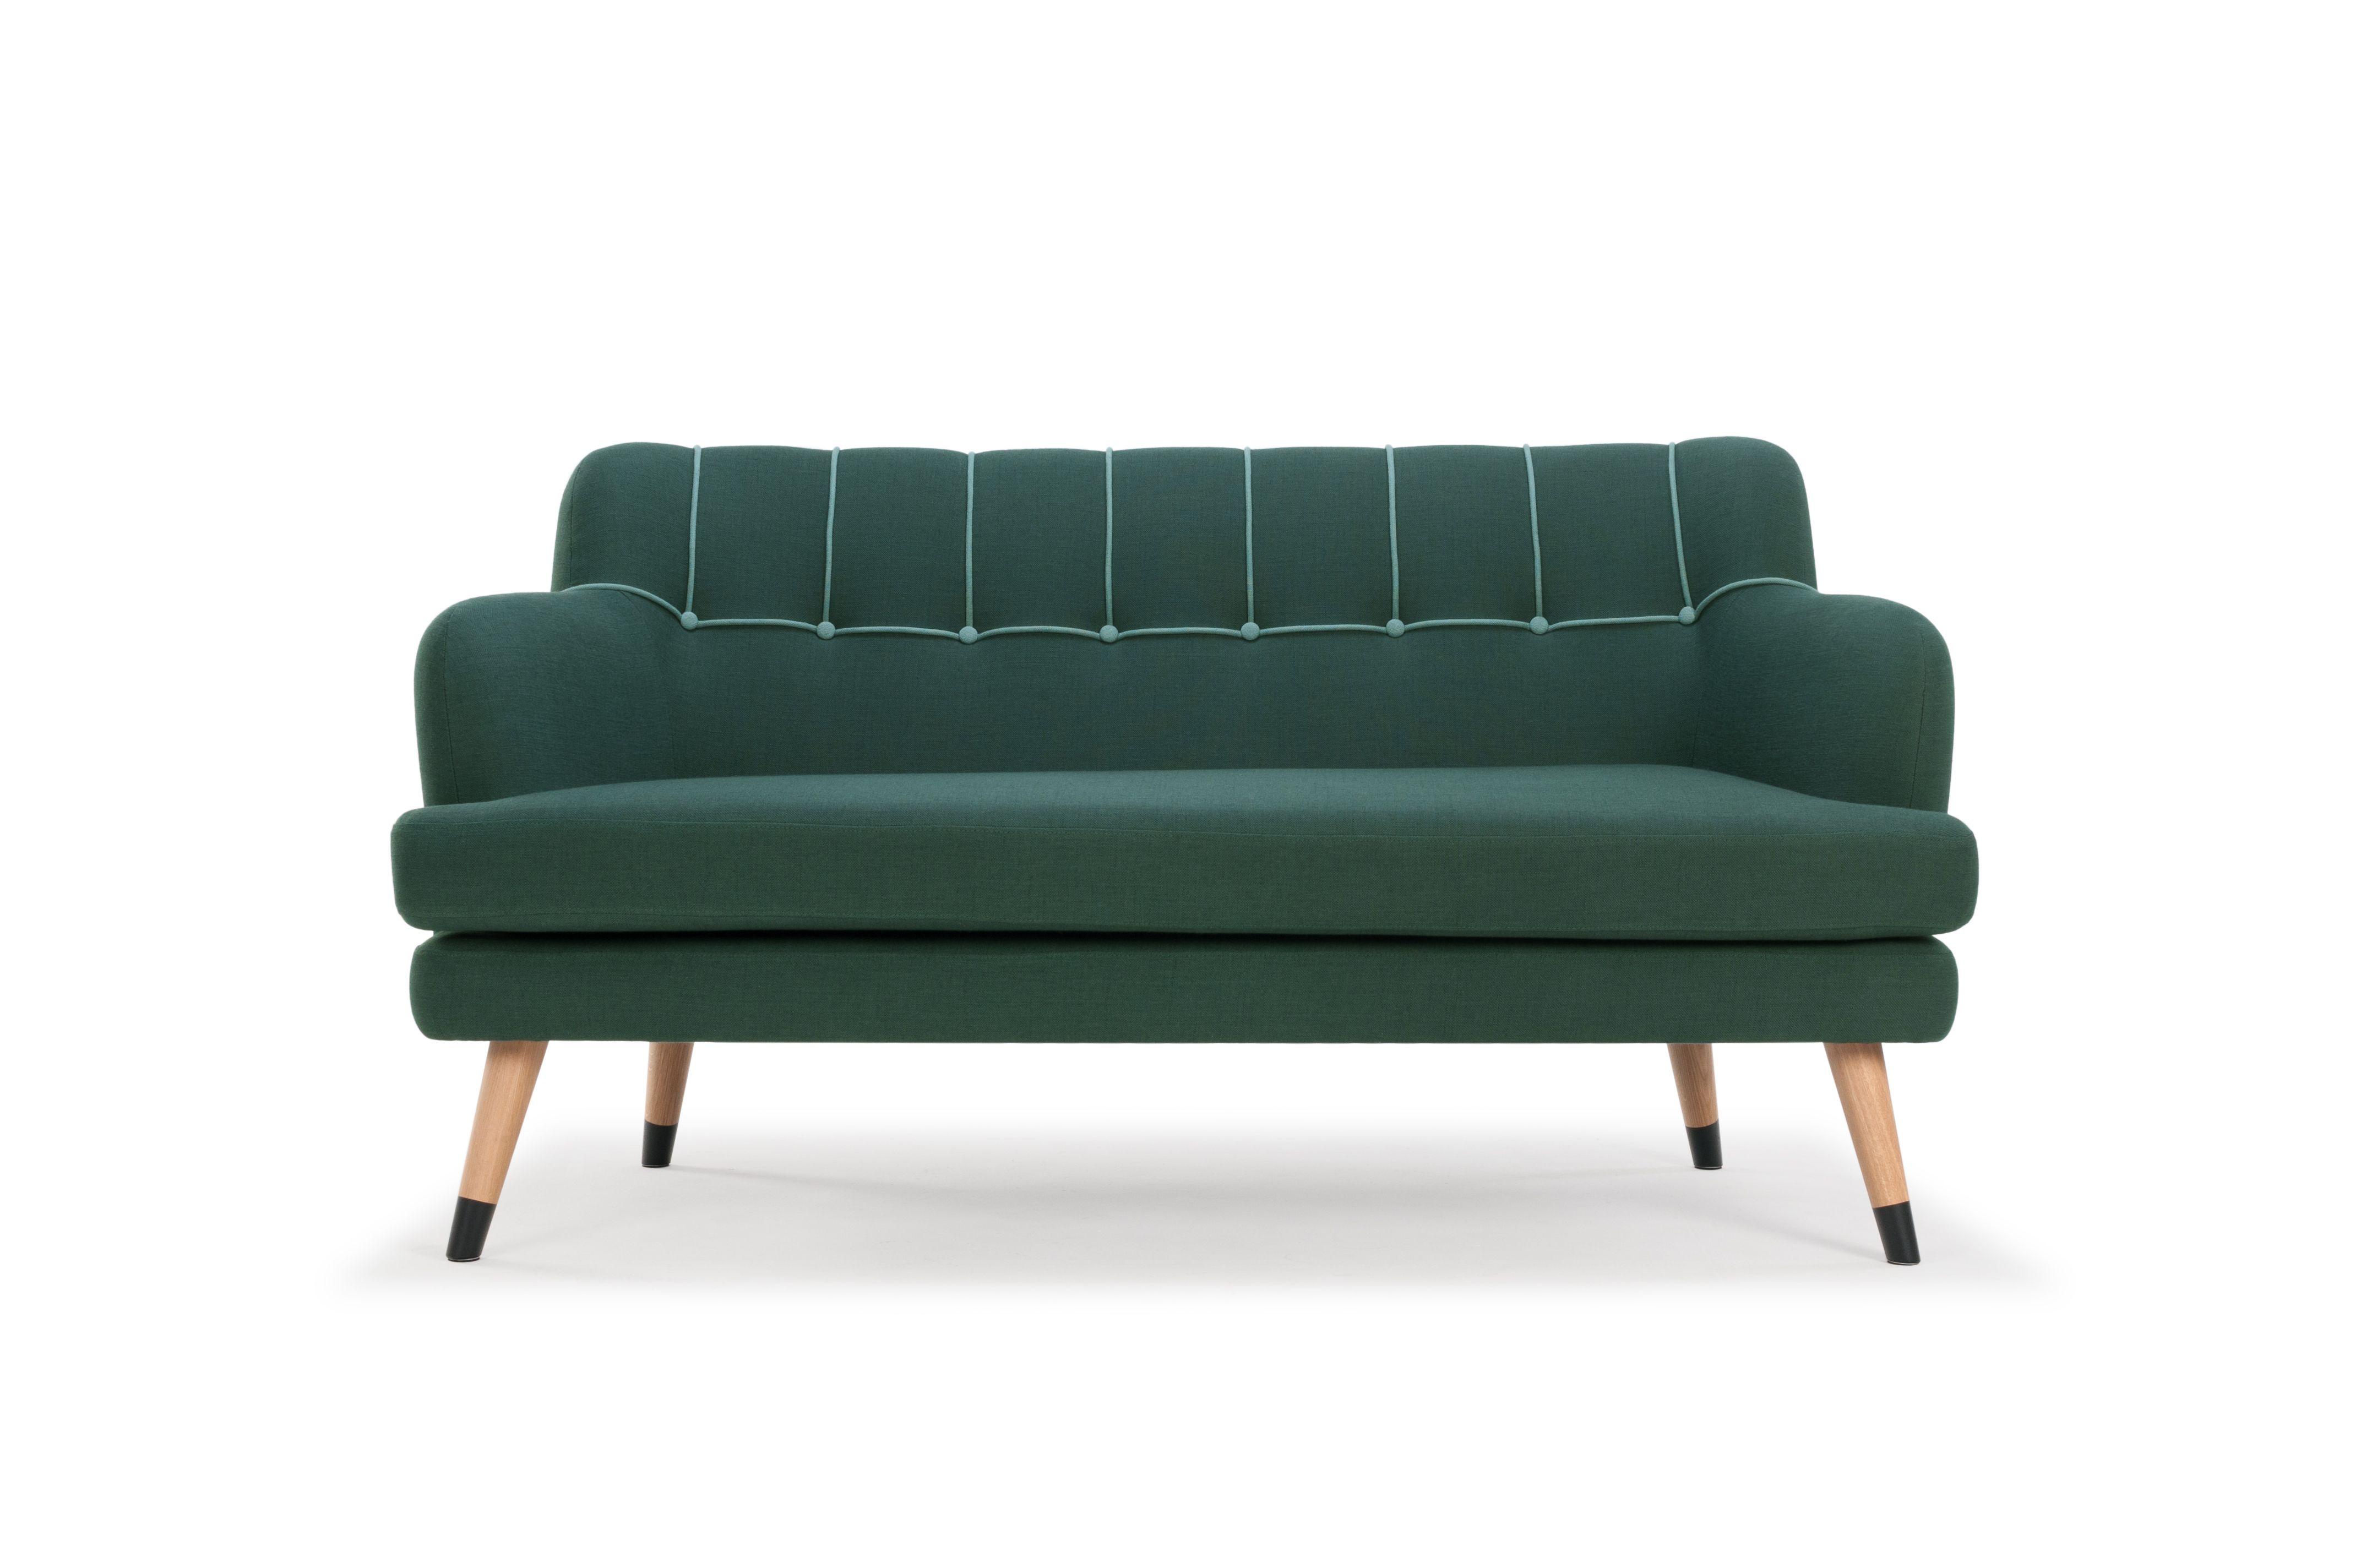 sofa company nl tommy bahama table edward https sofacompany com meubels banken 2 zitsbanken seater dina forest green sage oak legs w black socks